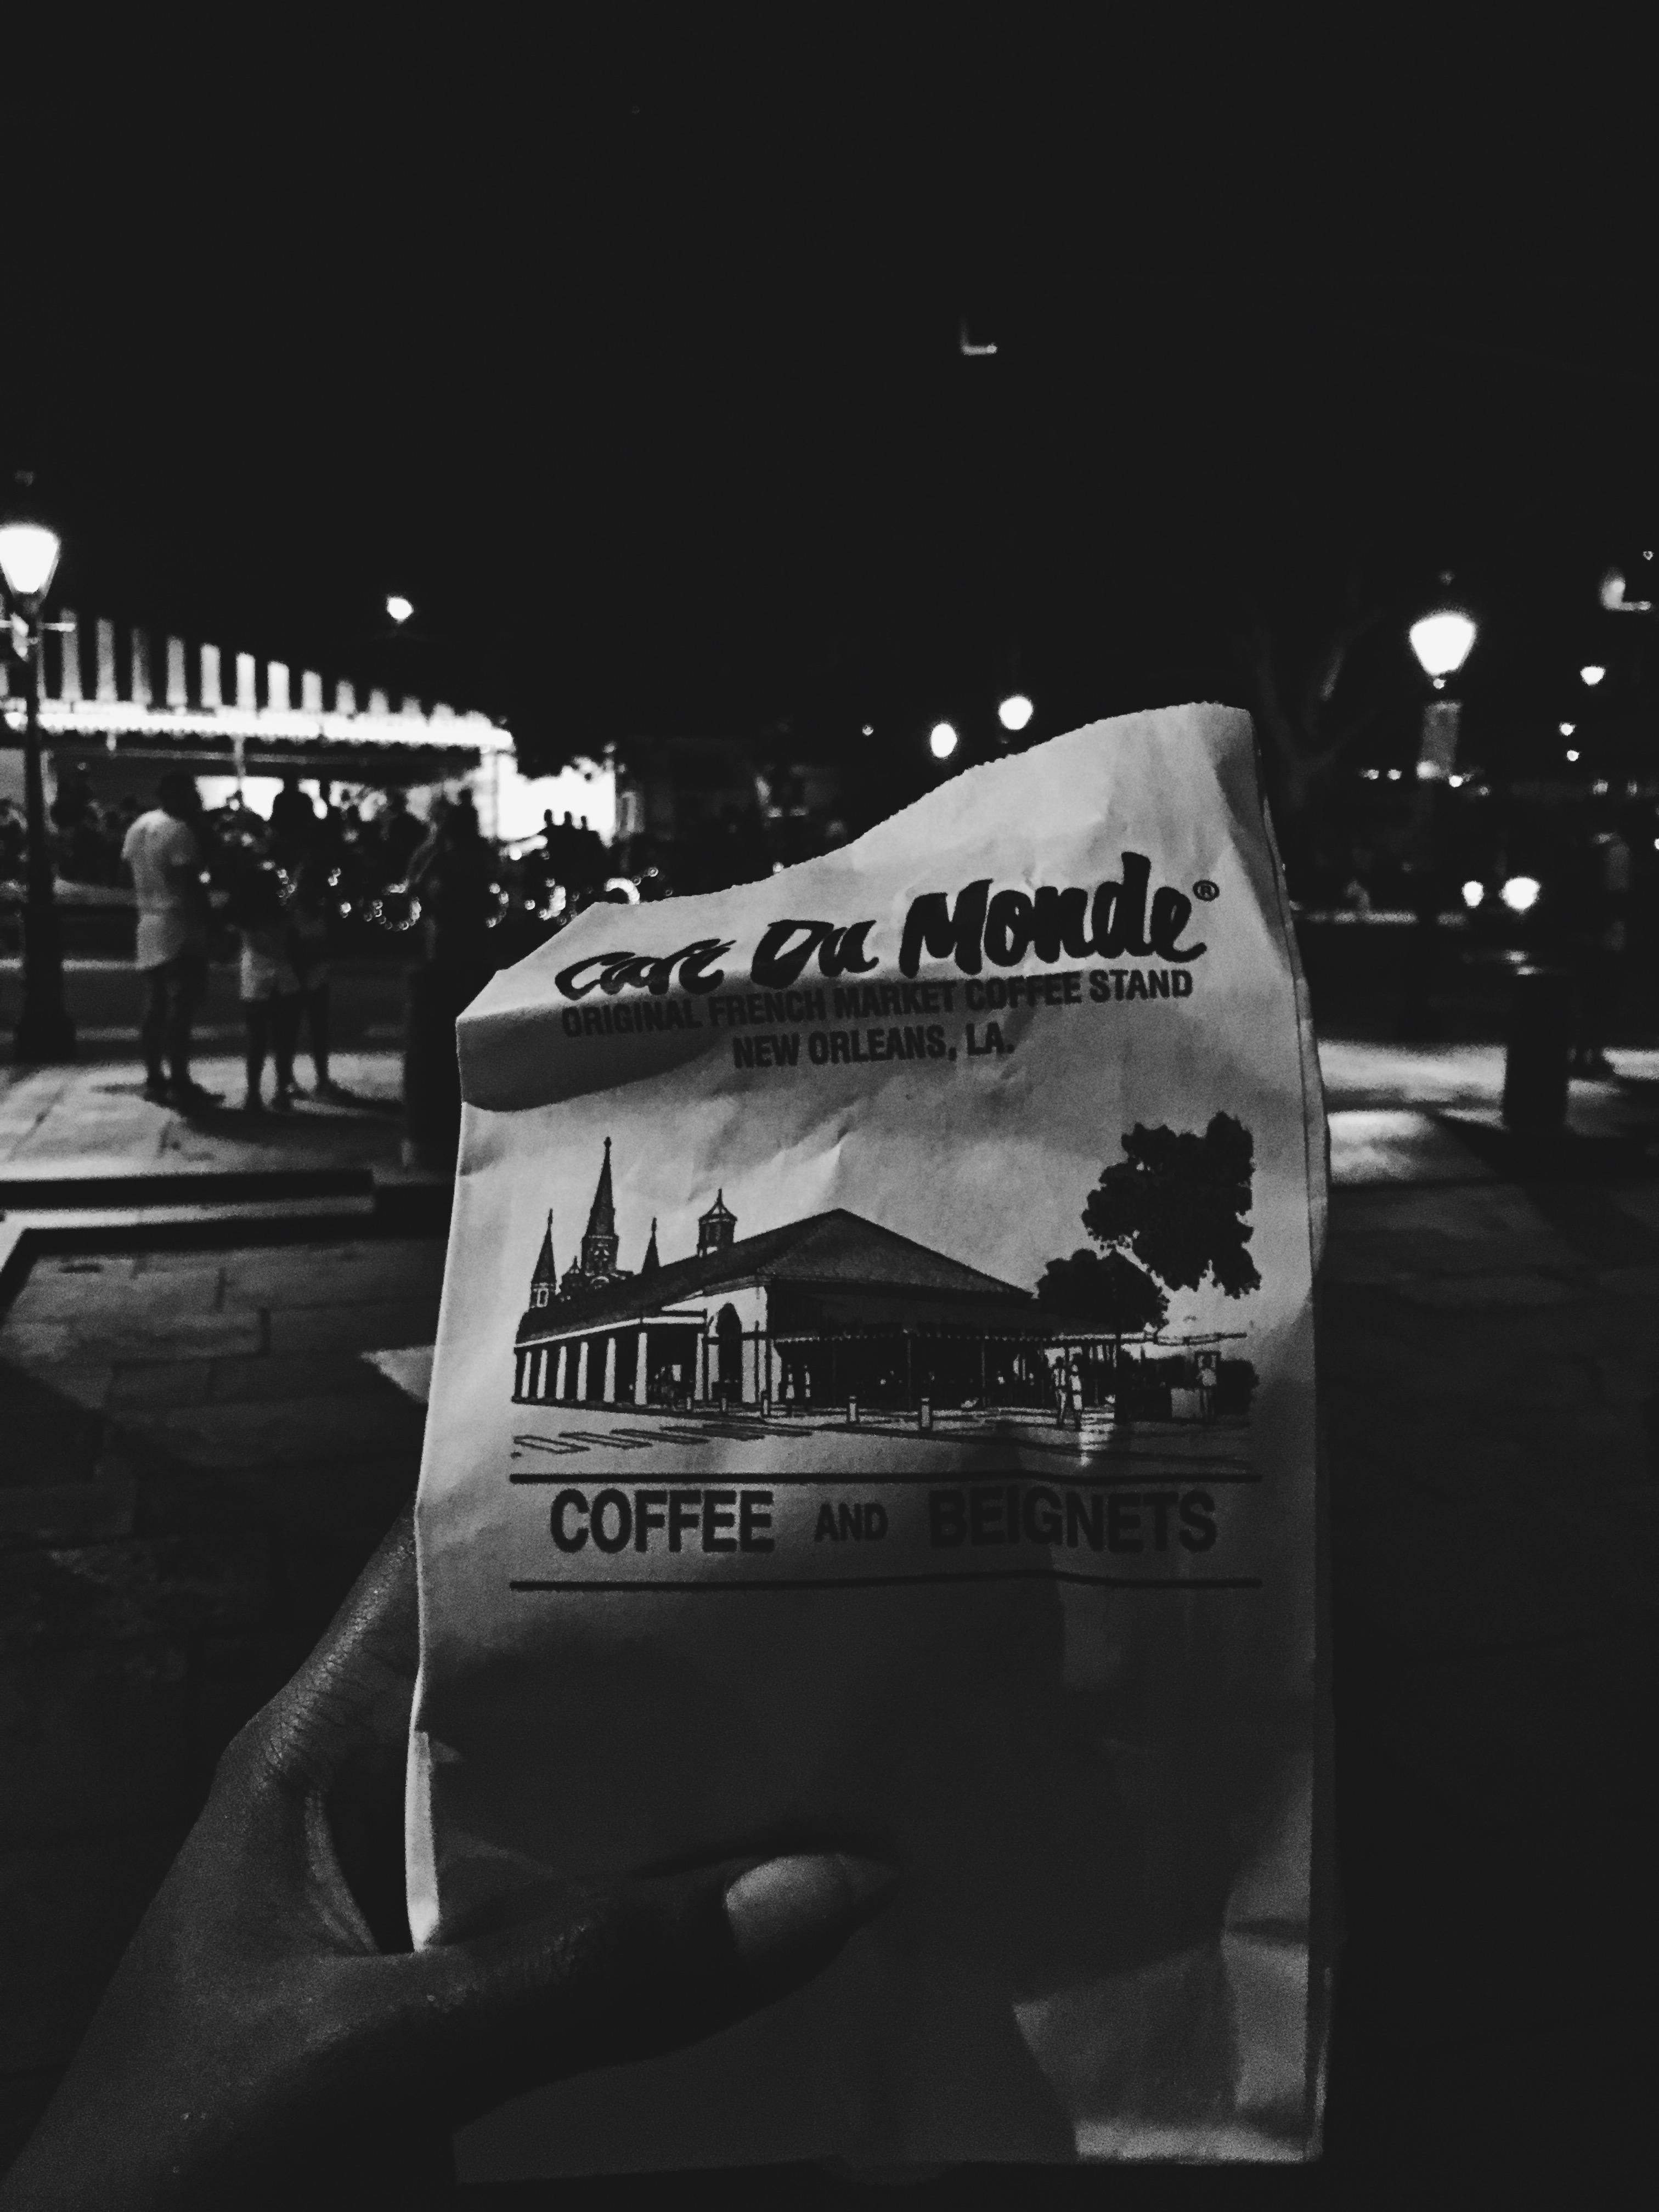 New Orleans-Beignets-cafe du monde